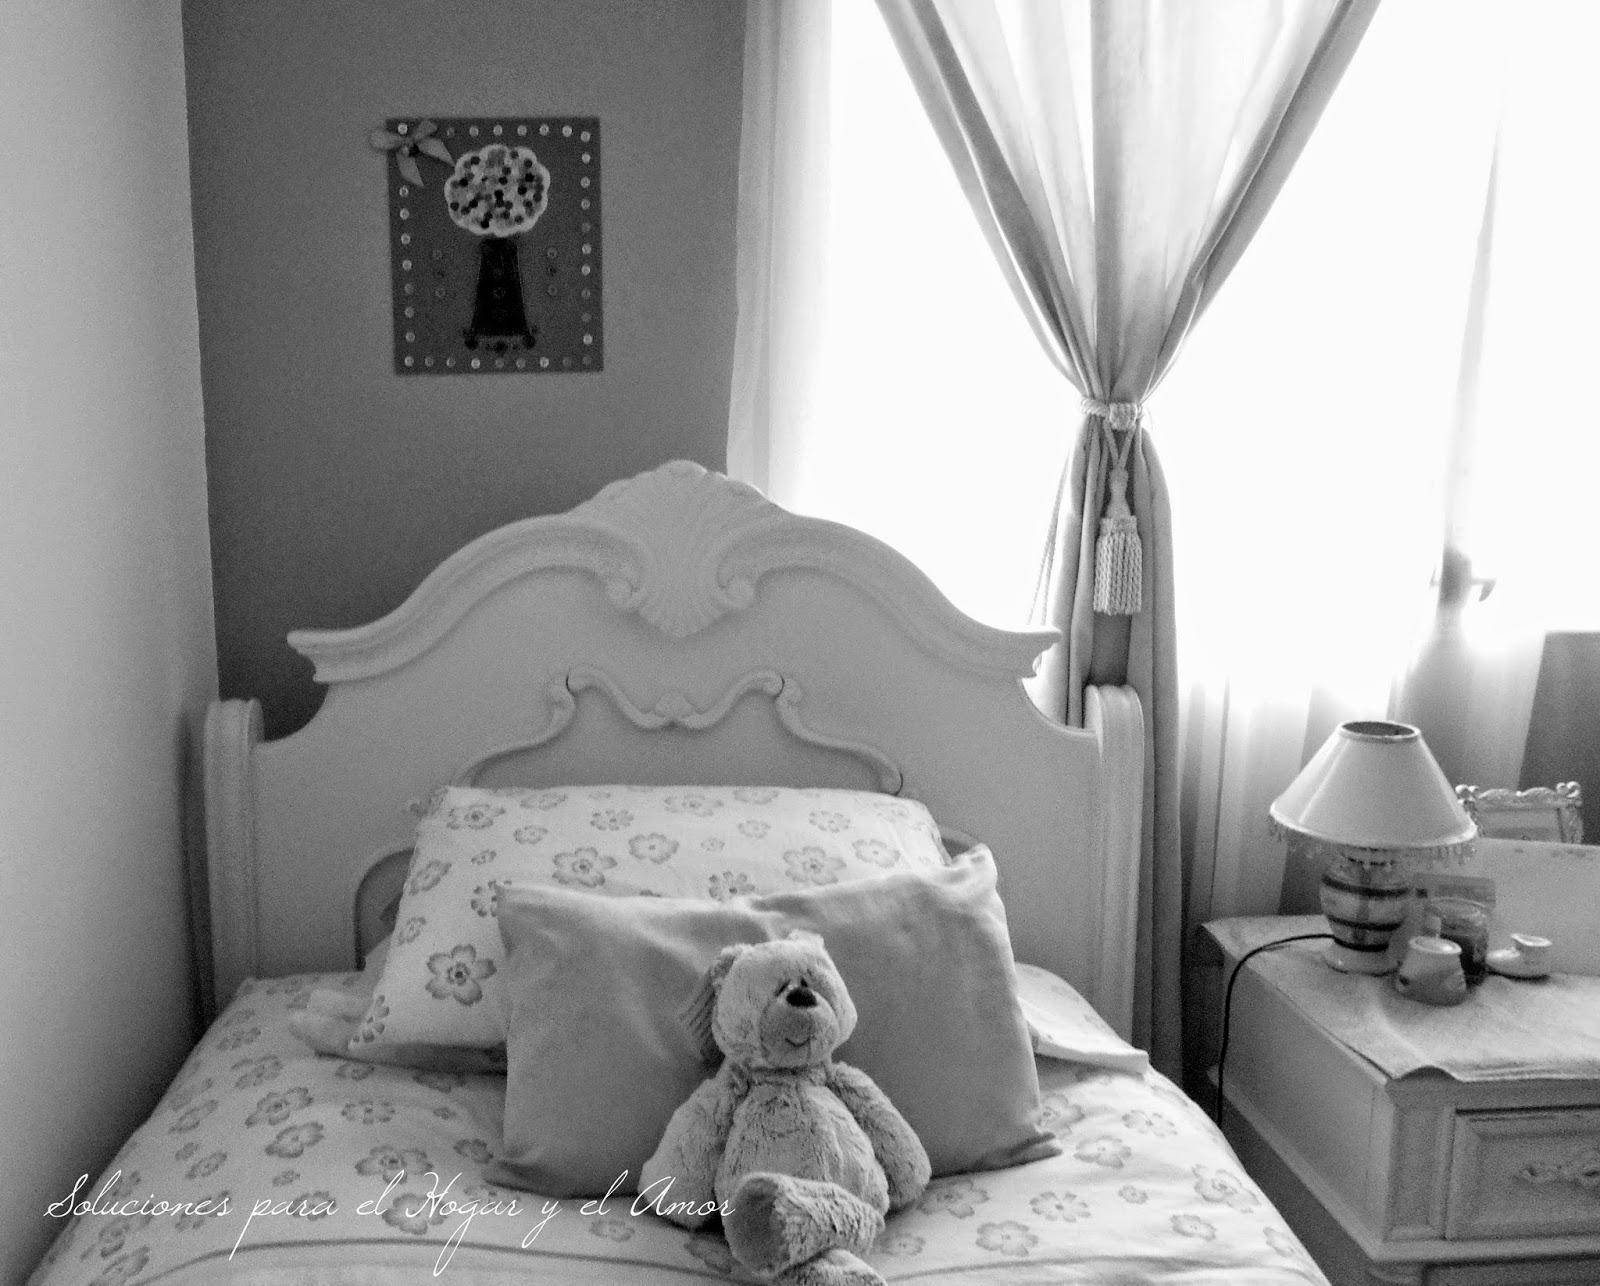 dormitorio decorado con cuadro hecho con botones, recamara de niña, decoración infantil, decoración recamara juvenil